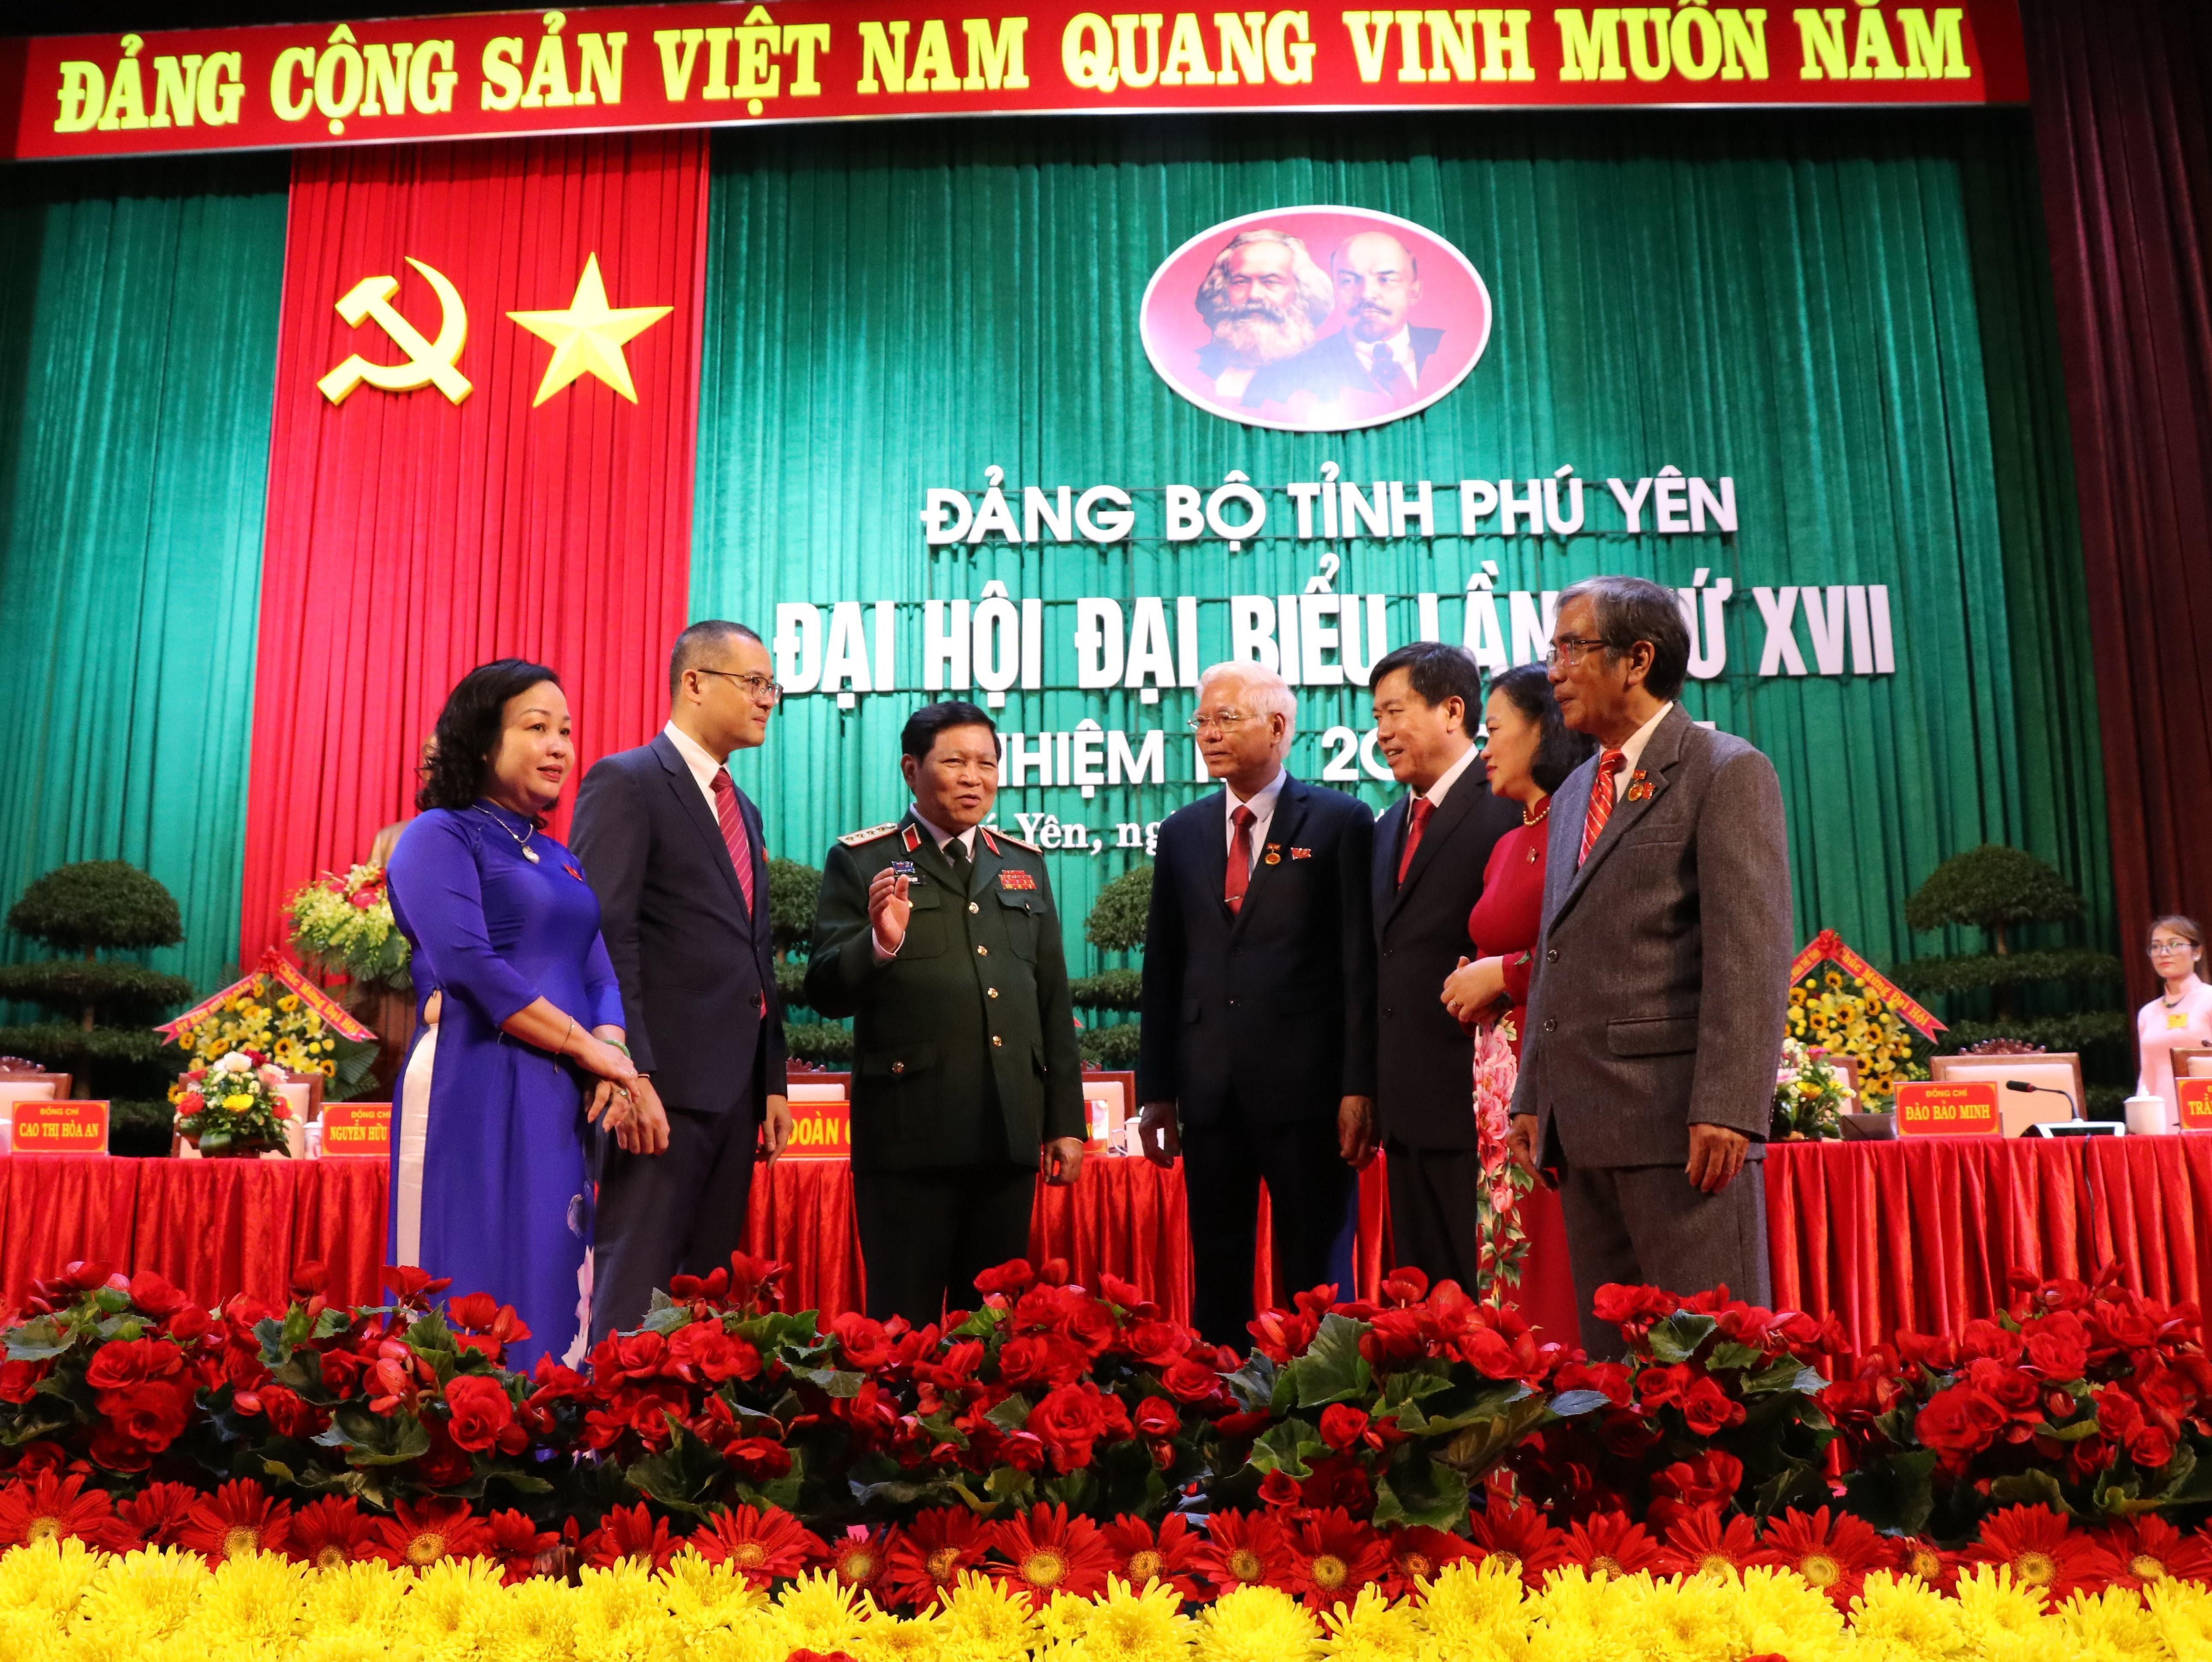 Hinh anh Dai hoi dai bieu Dang bo tinh Phu Yen lan thu XVII hinh anh 2